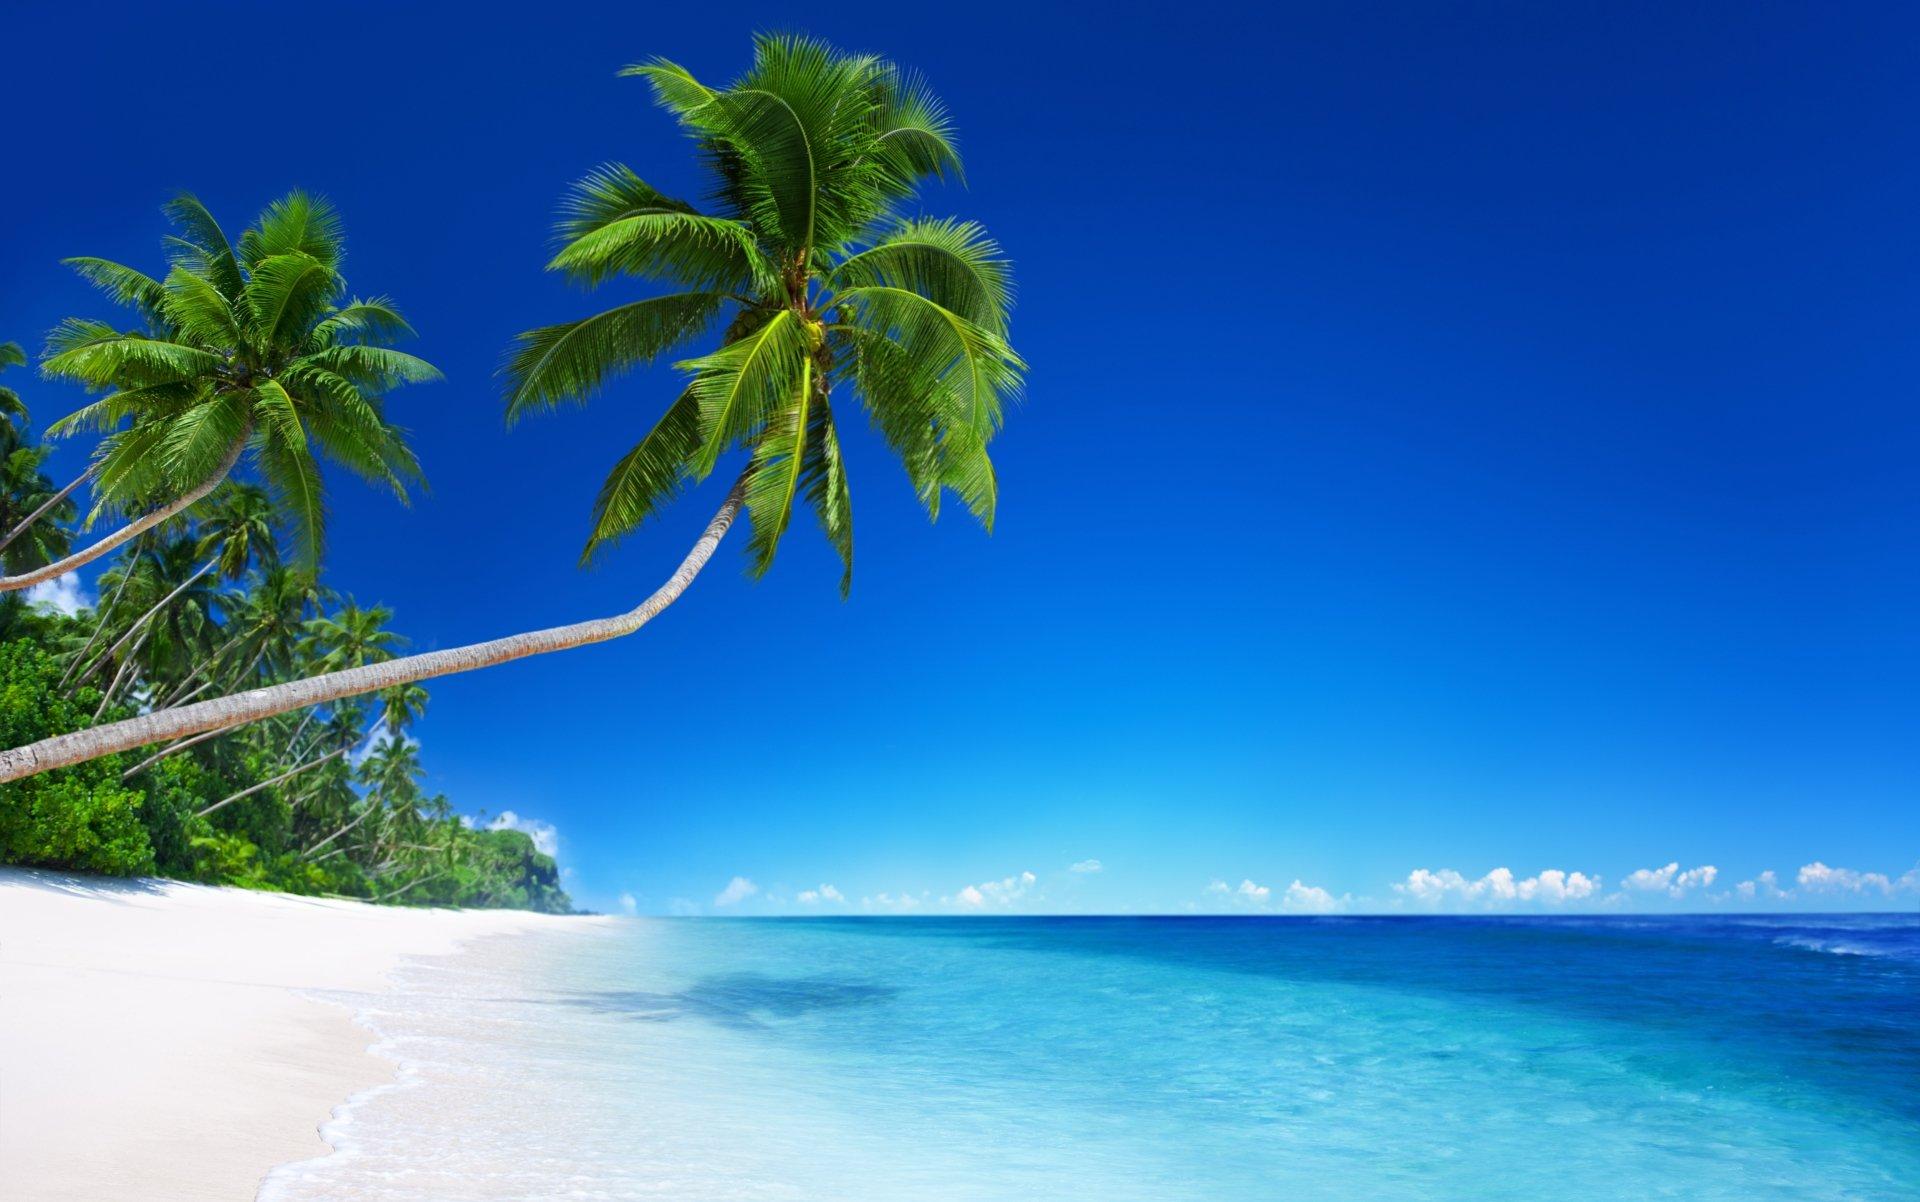 Tropics Palm Trees Sun Beach 4k Hd Desktop Wallpaper For: Palm Trees On Tropical Beach 4k Ultra HD Wallpaper